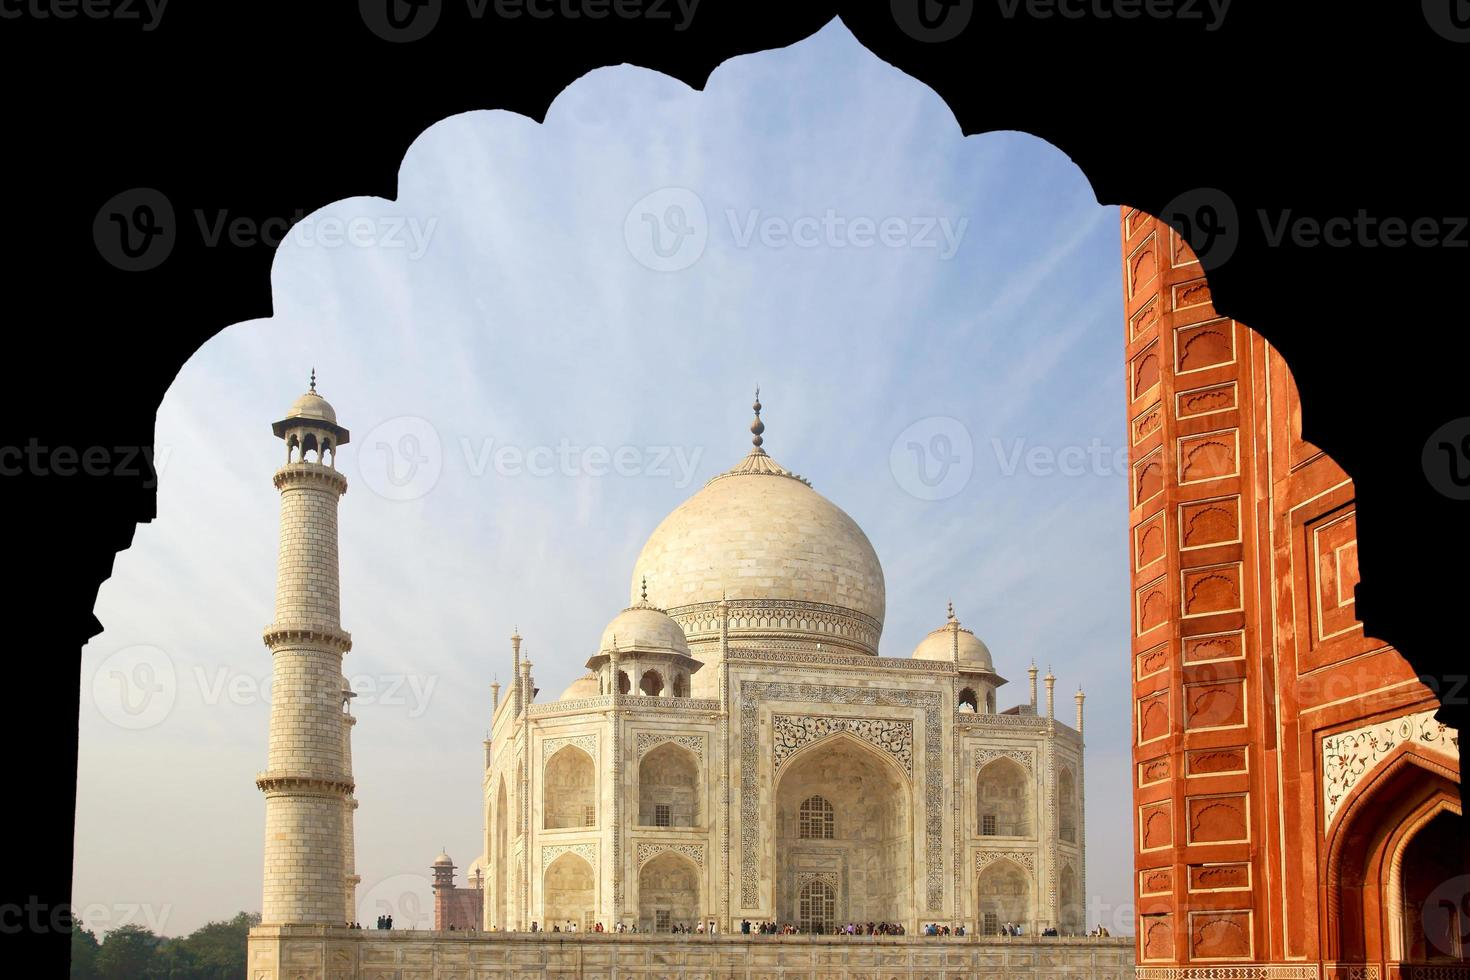 The Taj Mahal  white Marble mausoleum. photo